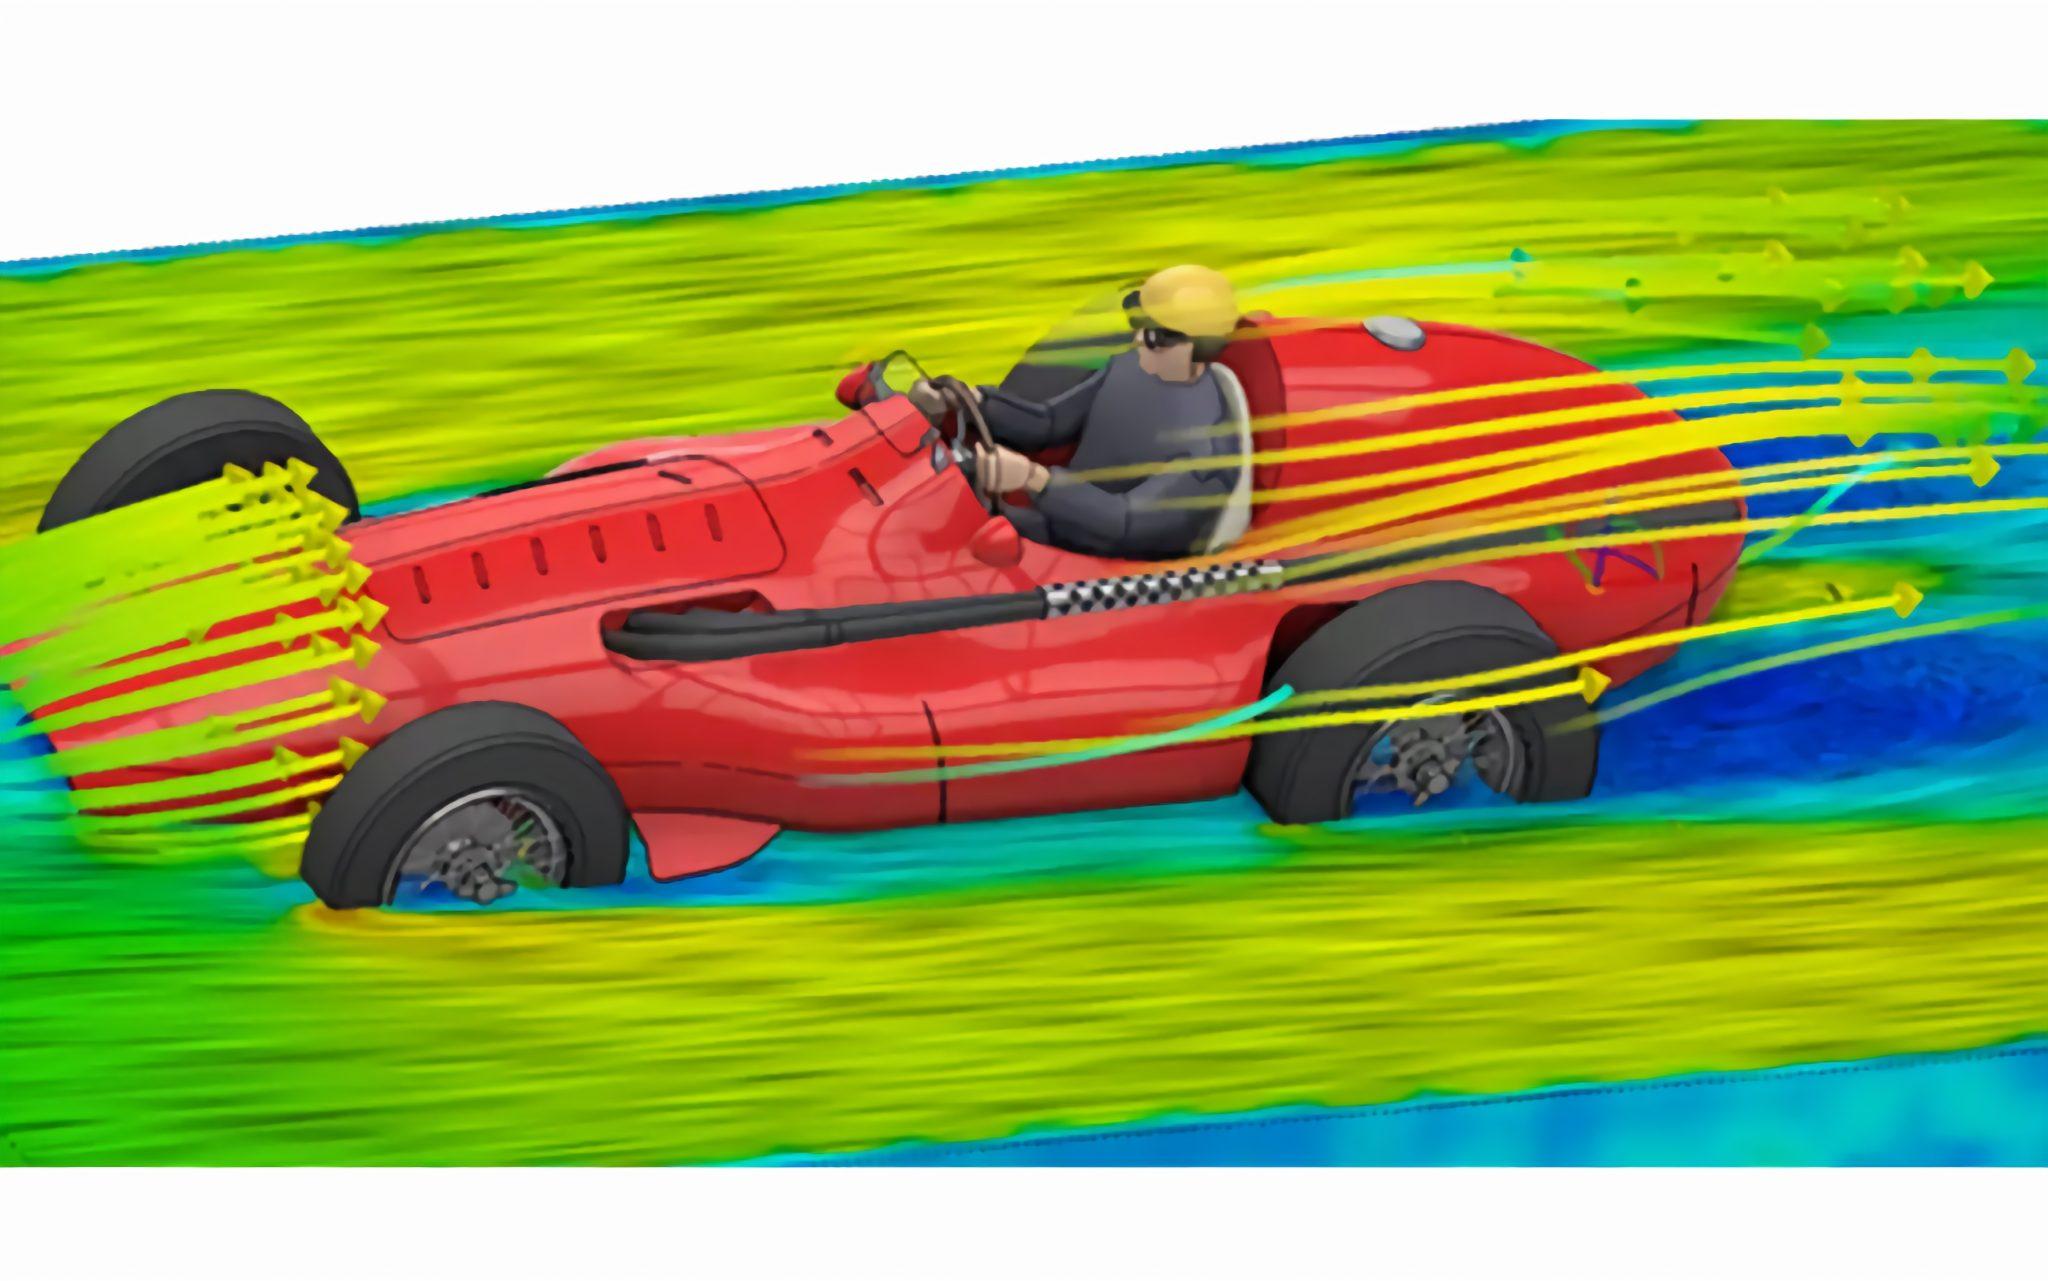 Car aerodynamics simulation in ANSYS. Image via Engineering